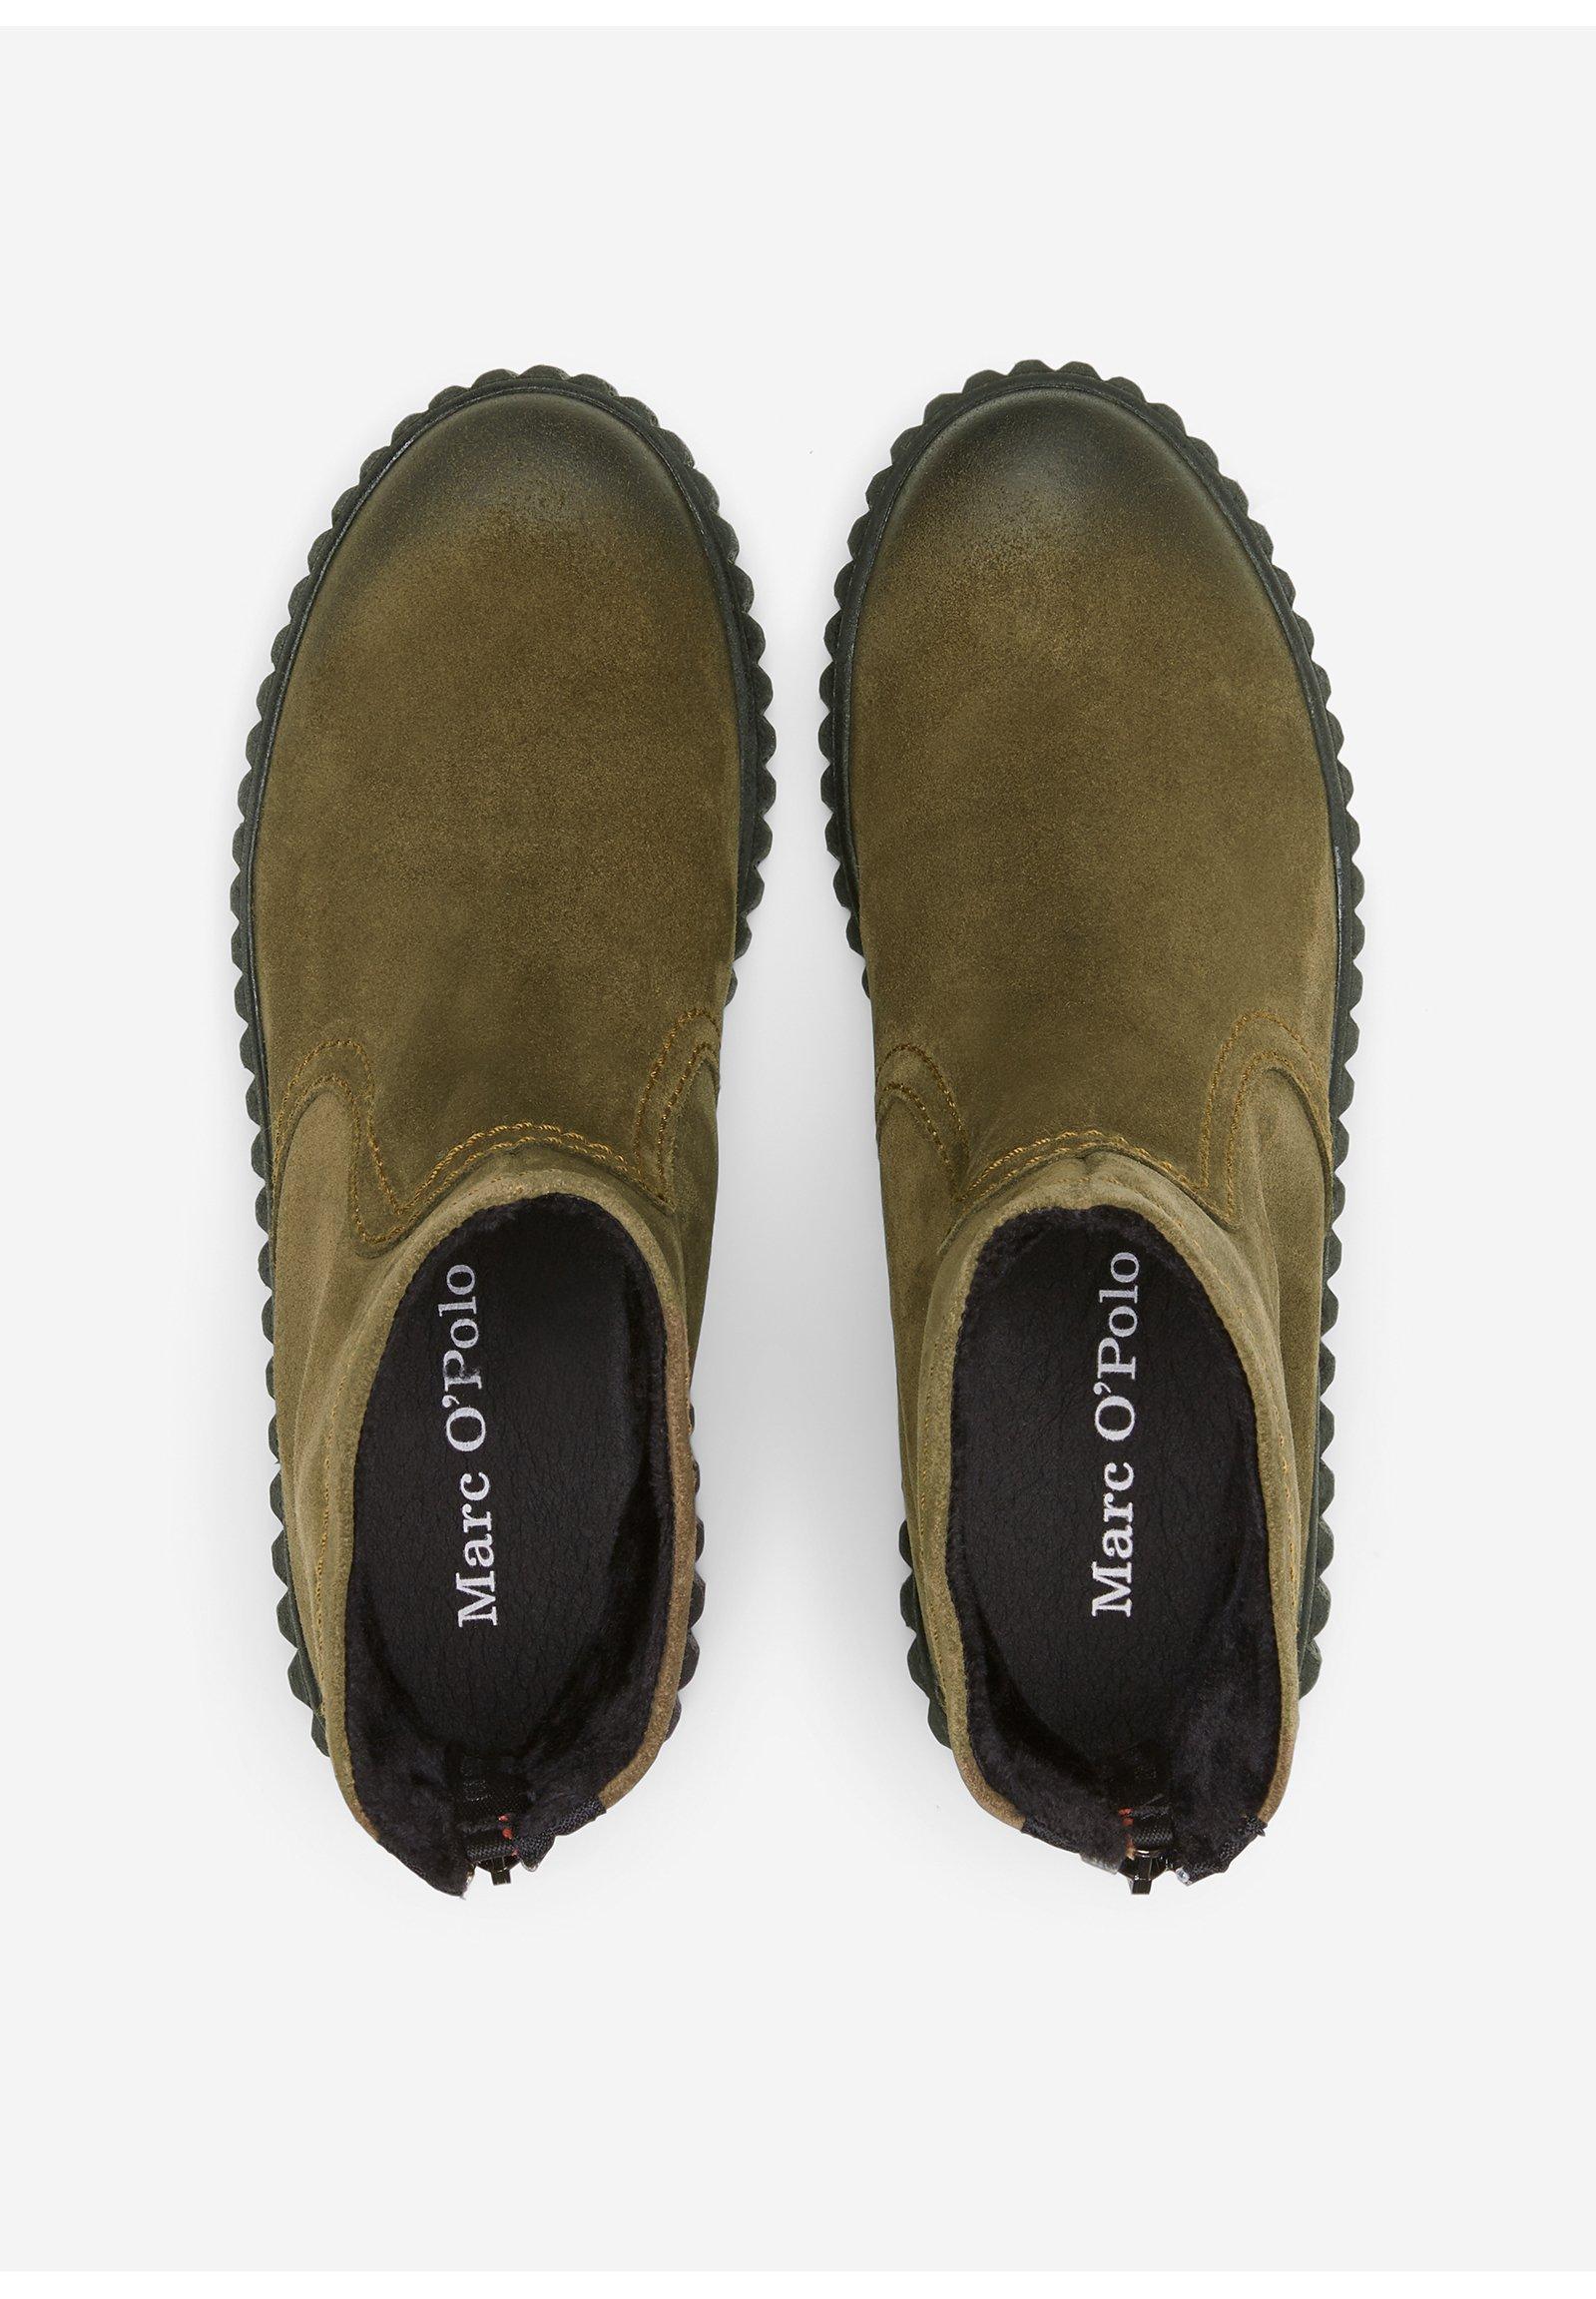 Marc O'polo Bianca - Ankle Boot Oliv/grün